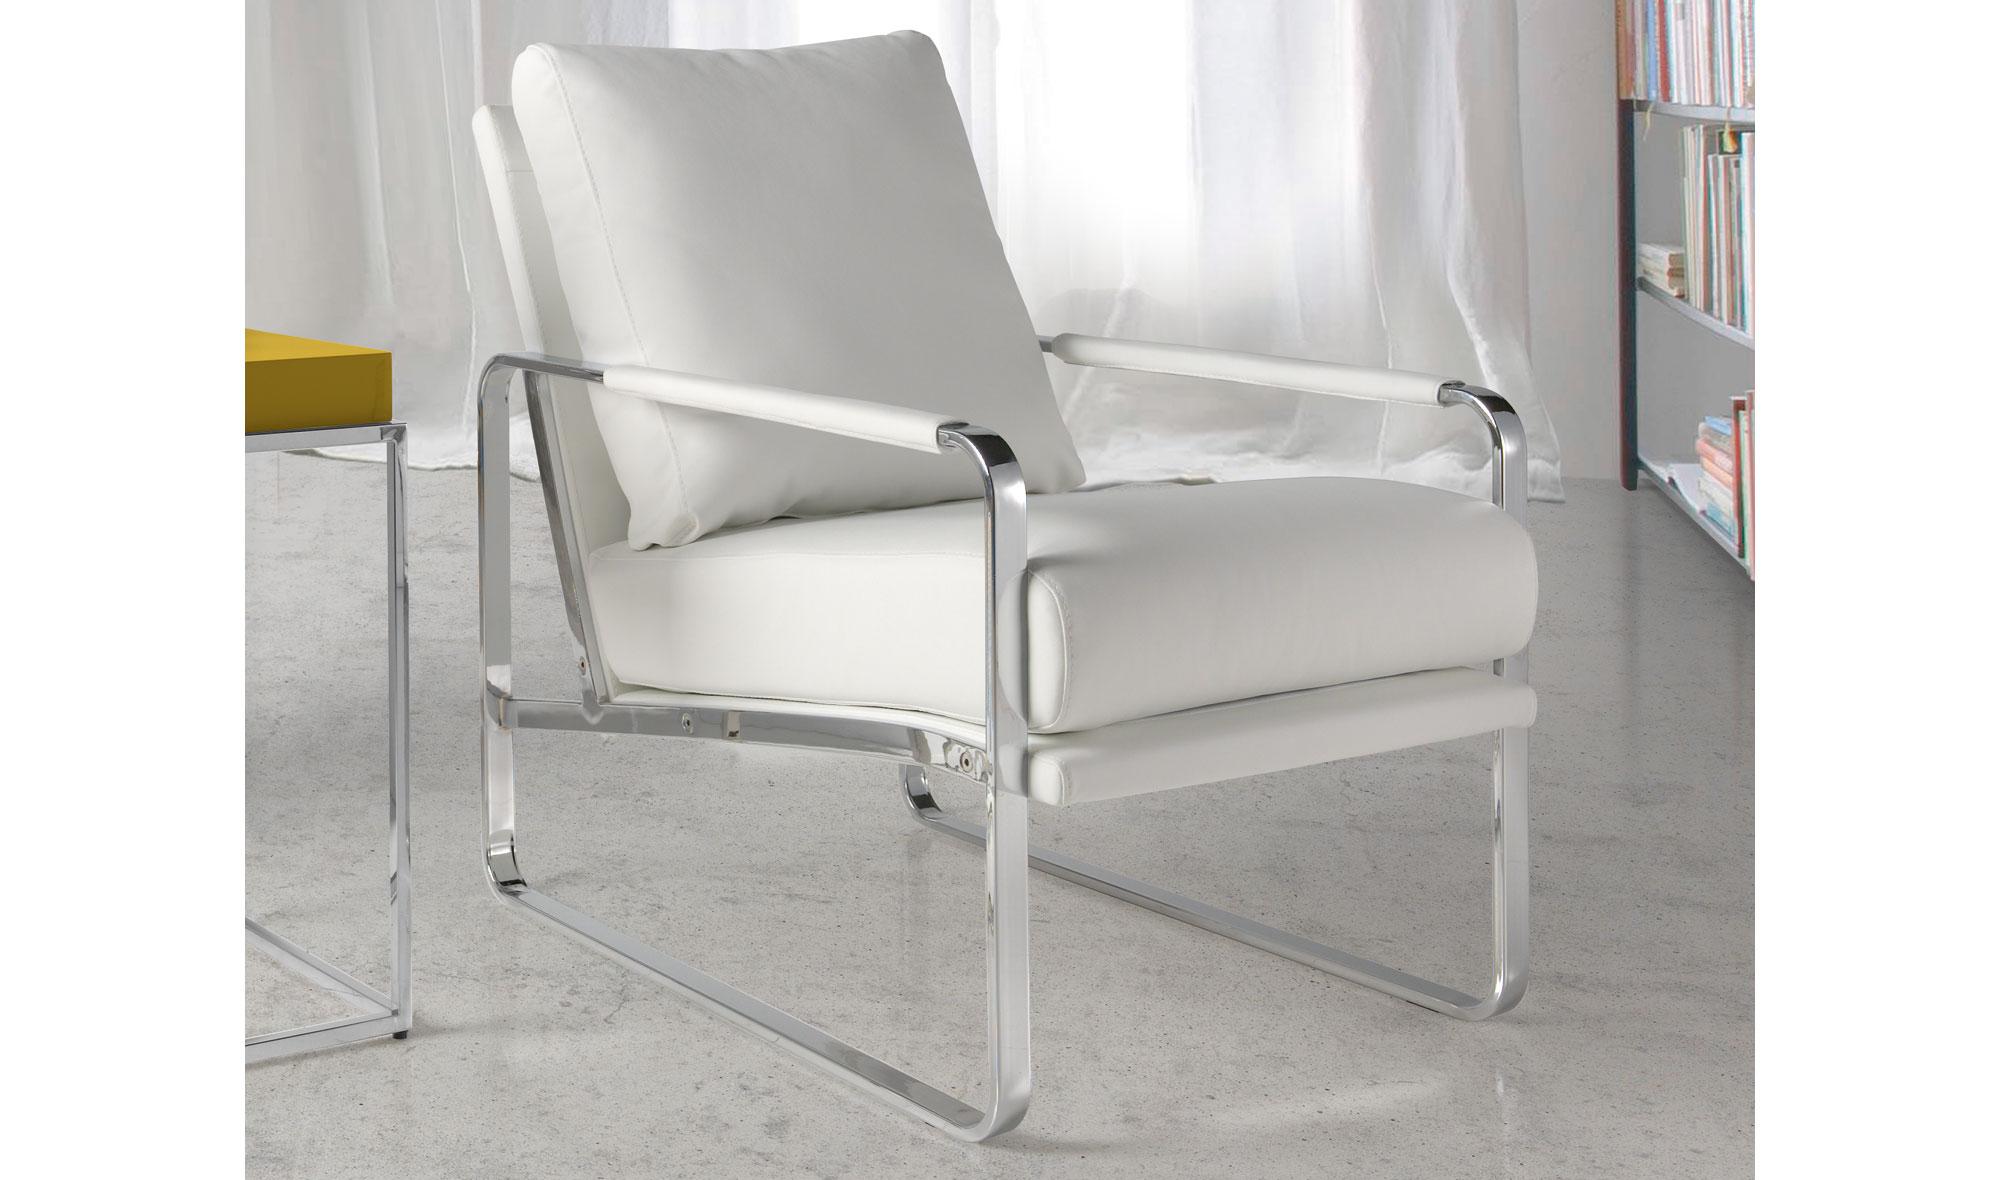 Butaca Moderna Amatique De Lujo En Portobellodeluxe Com Tu Tienda  # Muebles Butacas Modernas